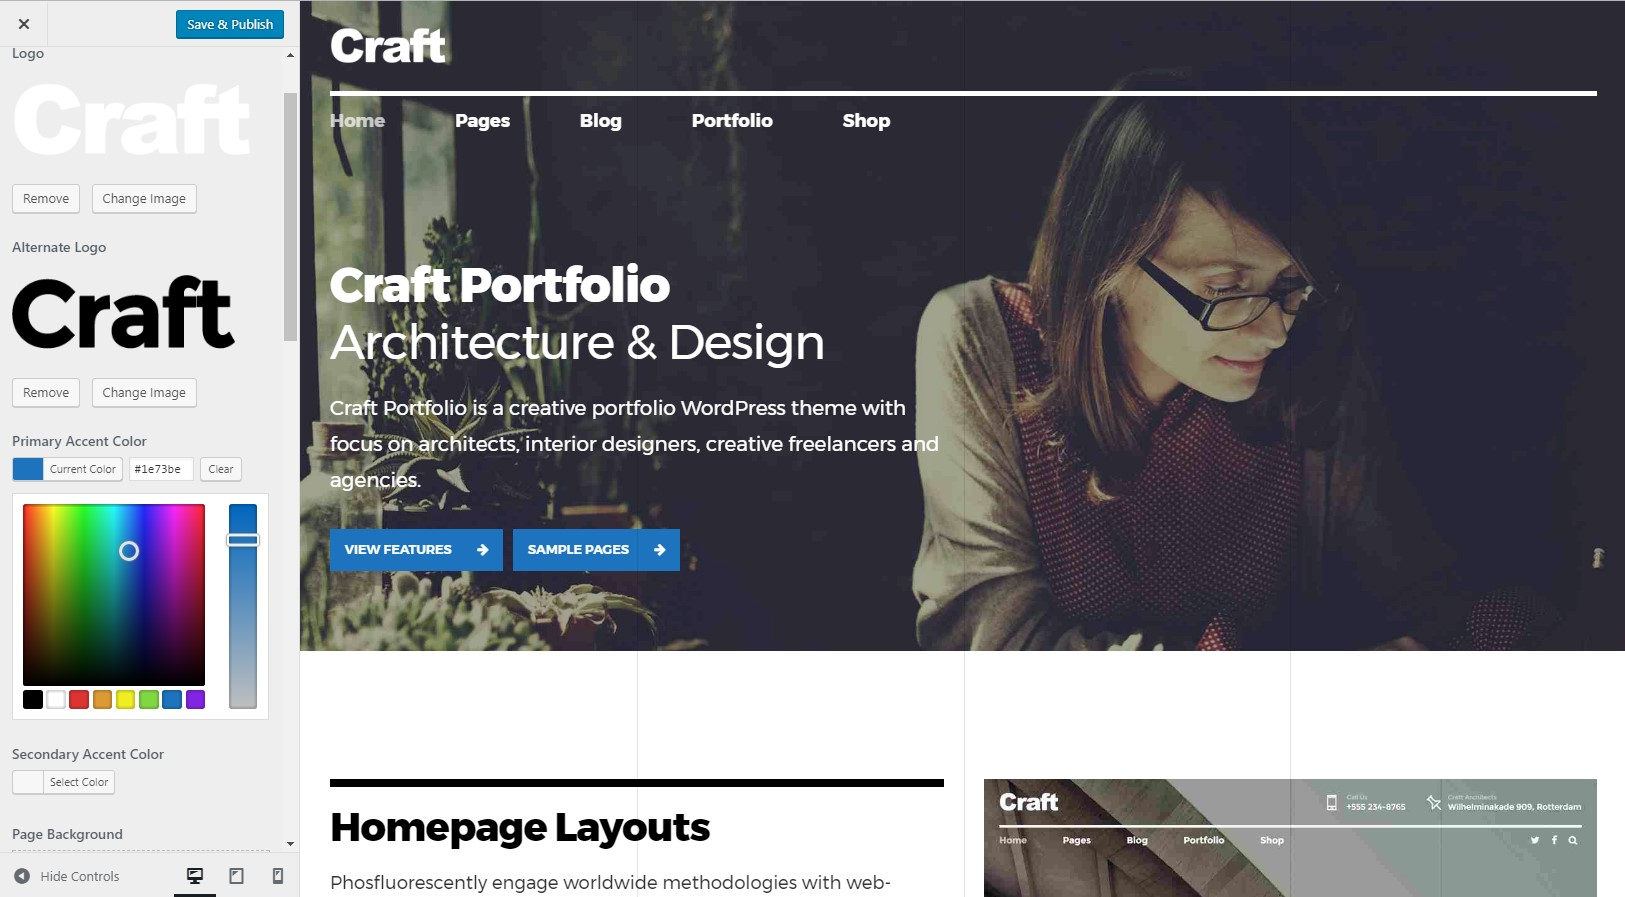 https://documentation.bold-themes.com/craft-portfolio/wp-content/uploads/sites/24/2017/09/accent-color.jpg